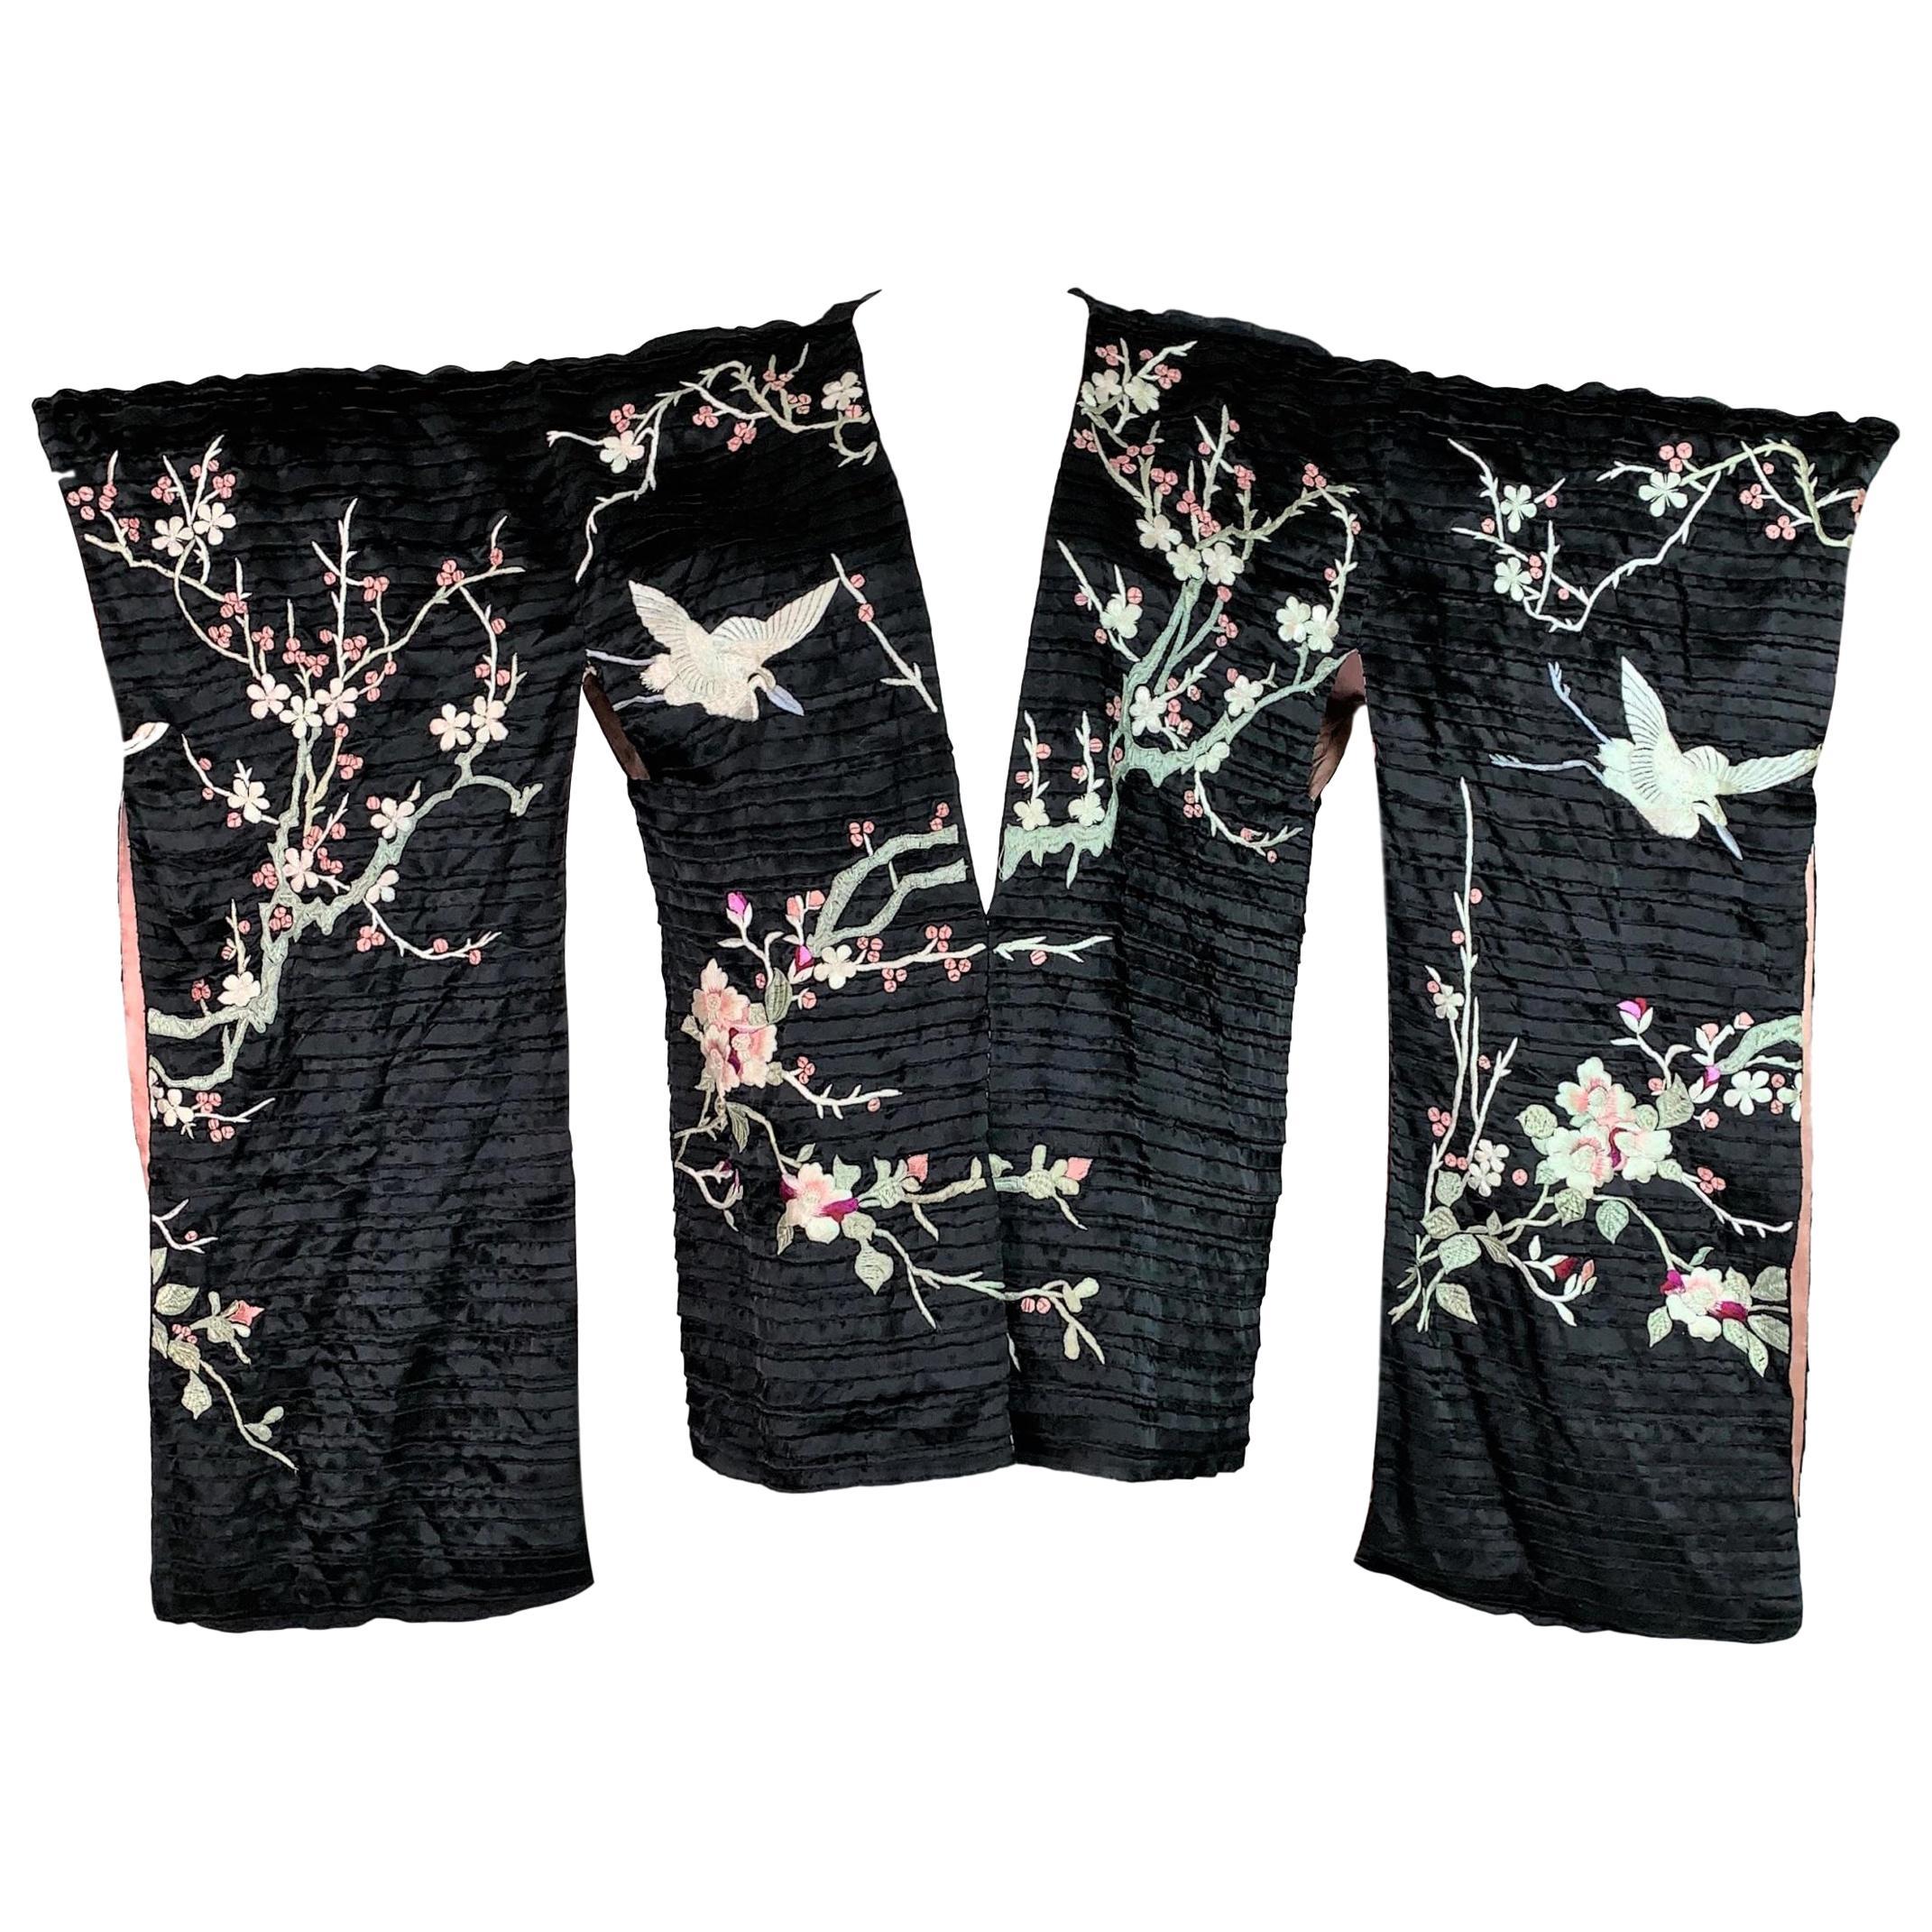 S/S 2003 Gucci Tom Ford Runway Black Embroidered Cherry Blossom Kimono Dress